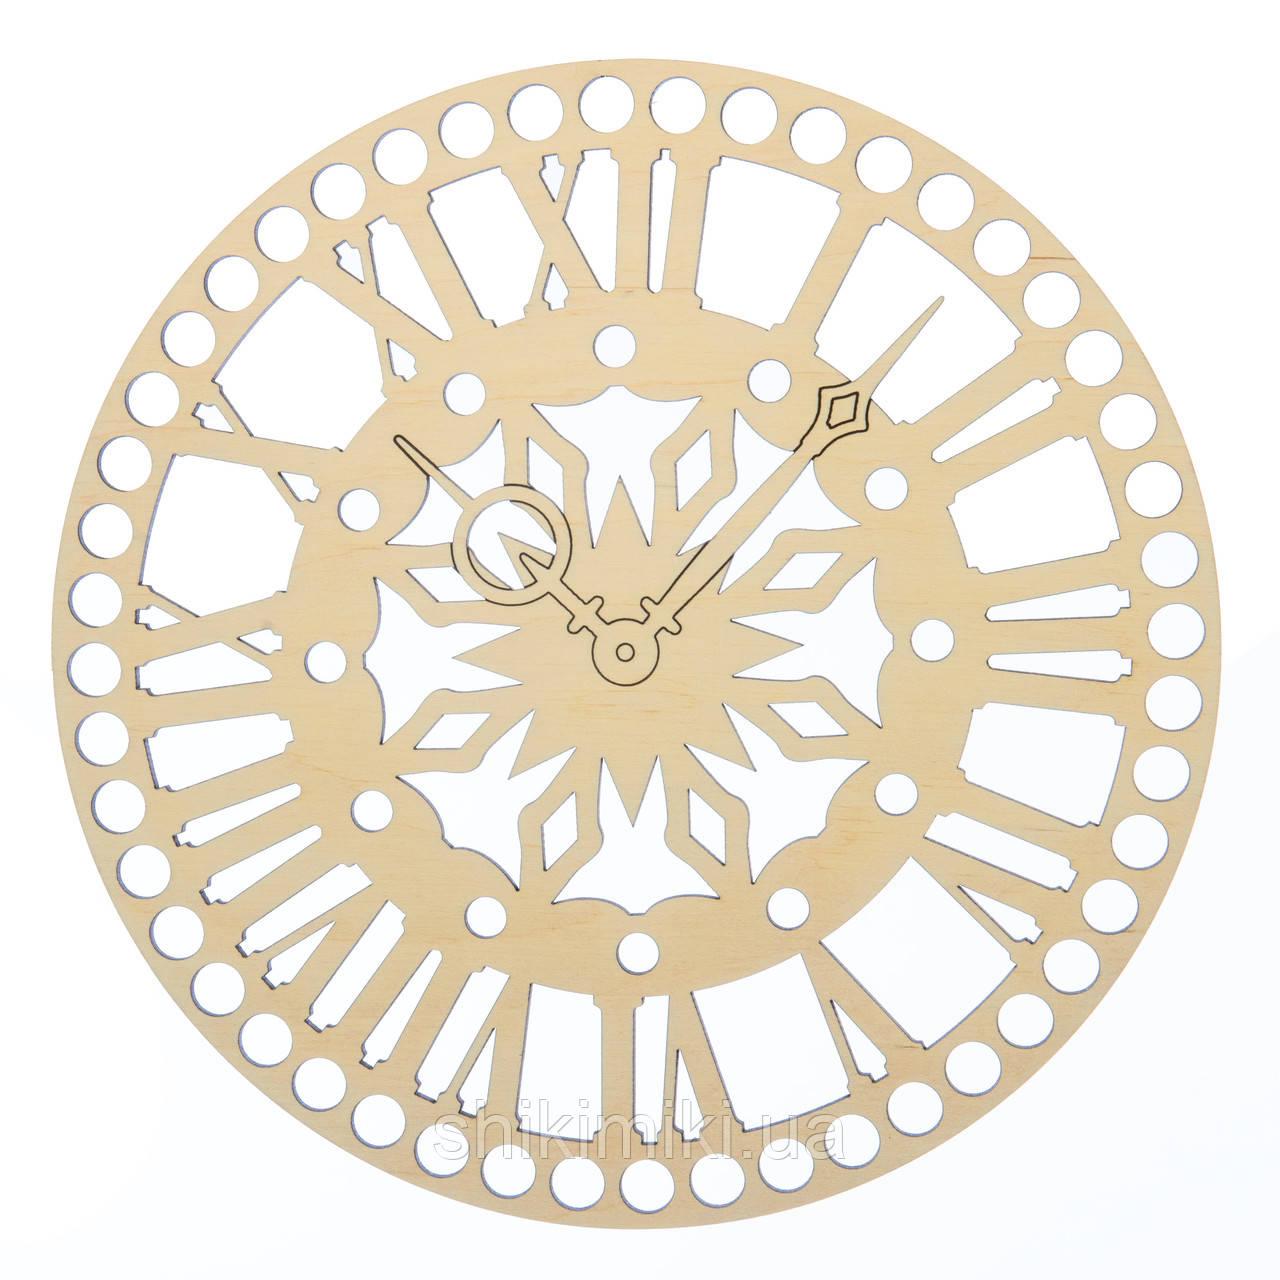 Заготовка из фанеры ажурная круглая -57 (20 см)